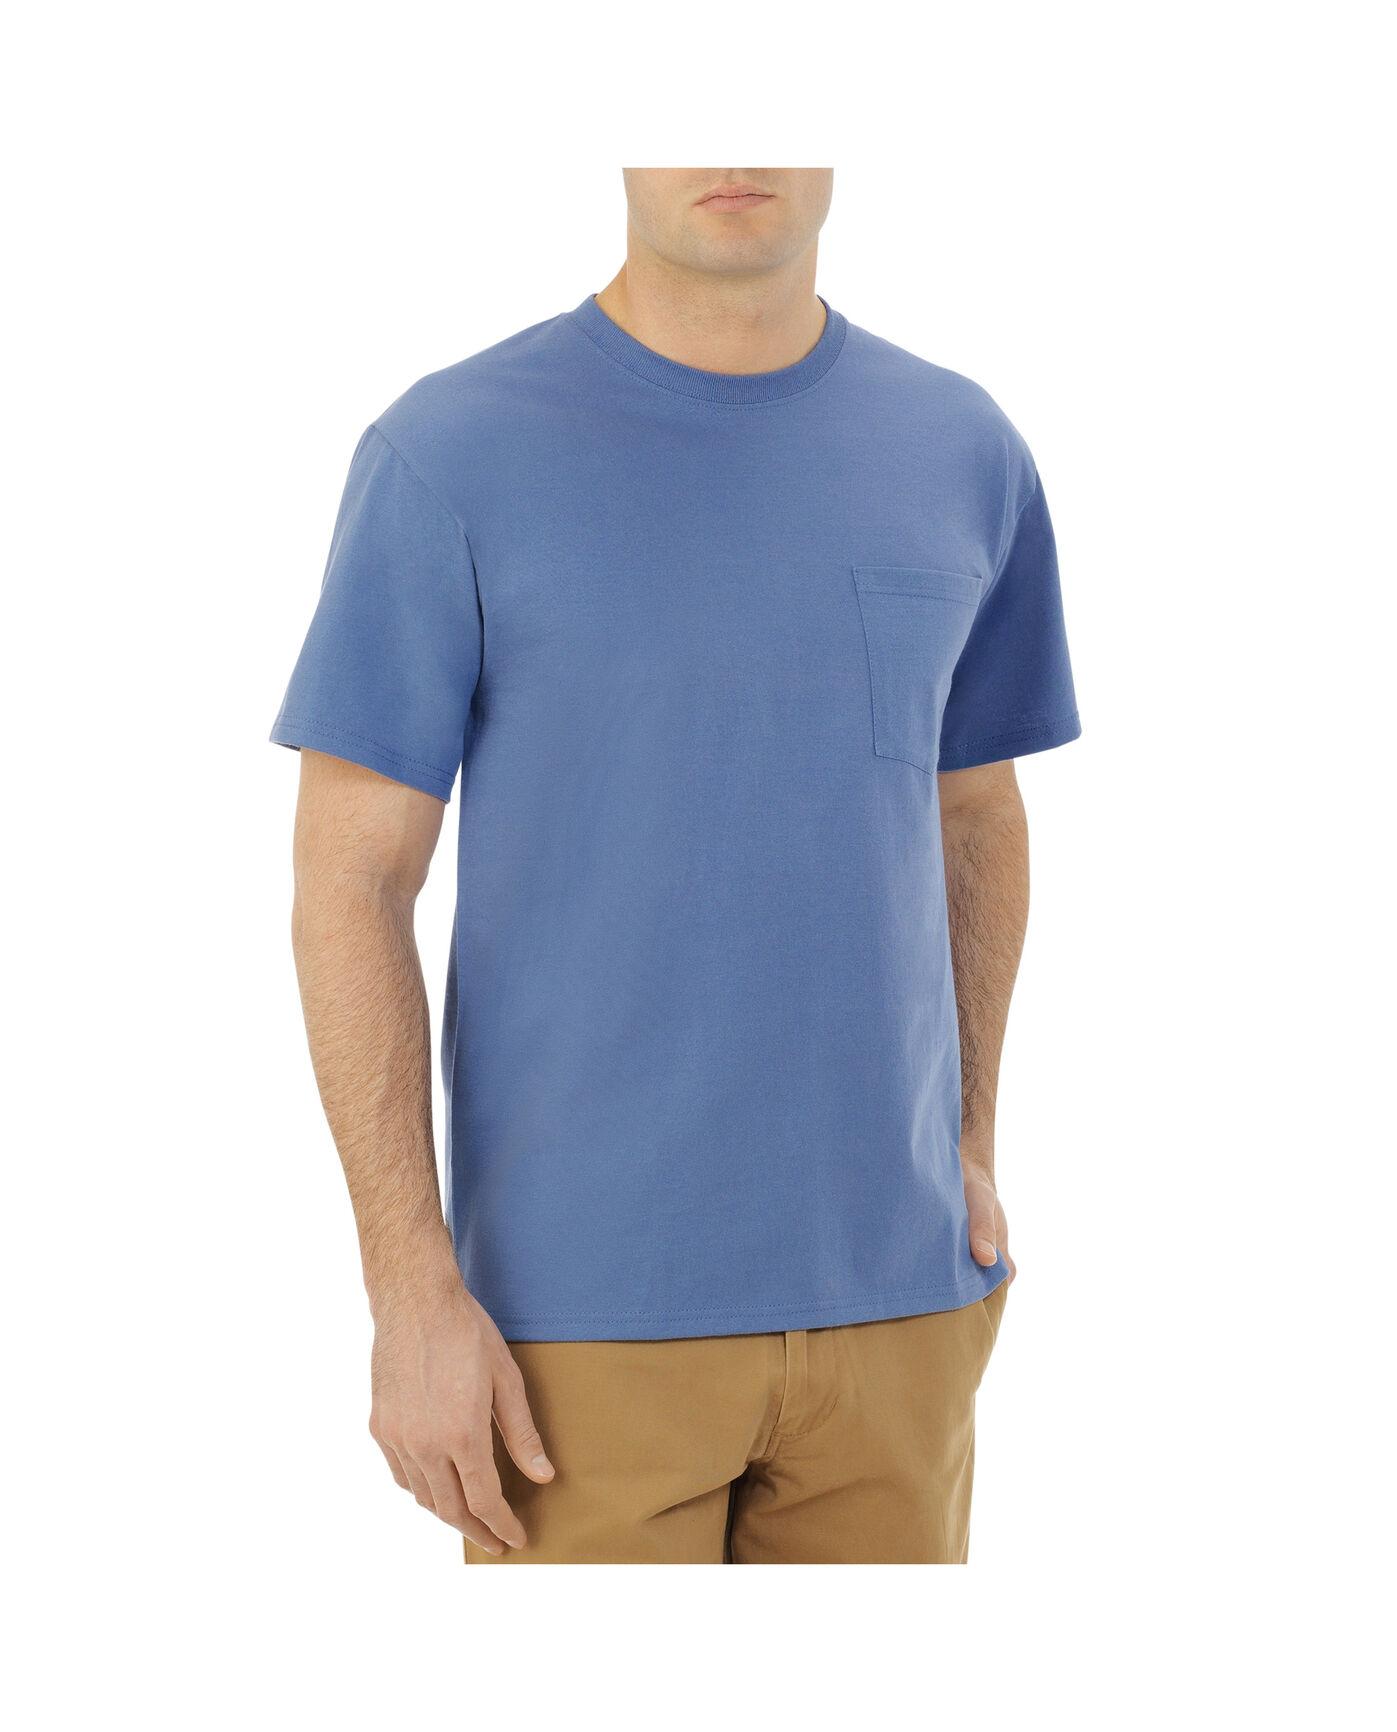 fb558996f Long Sleeve Pocket T Shirts Fruit Of The Loom - DREAMWORKS